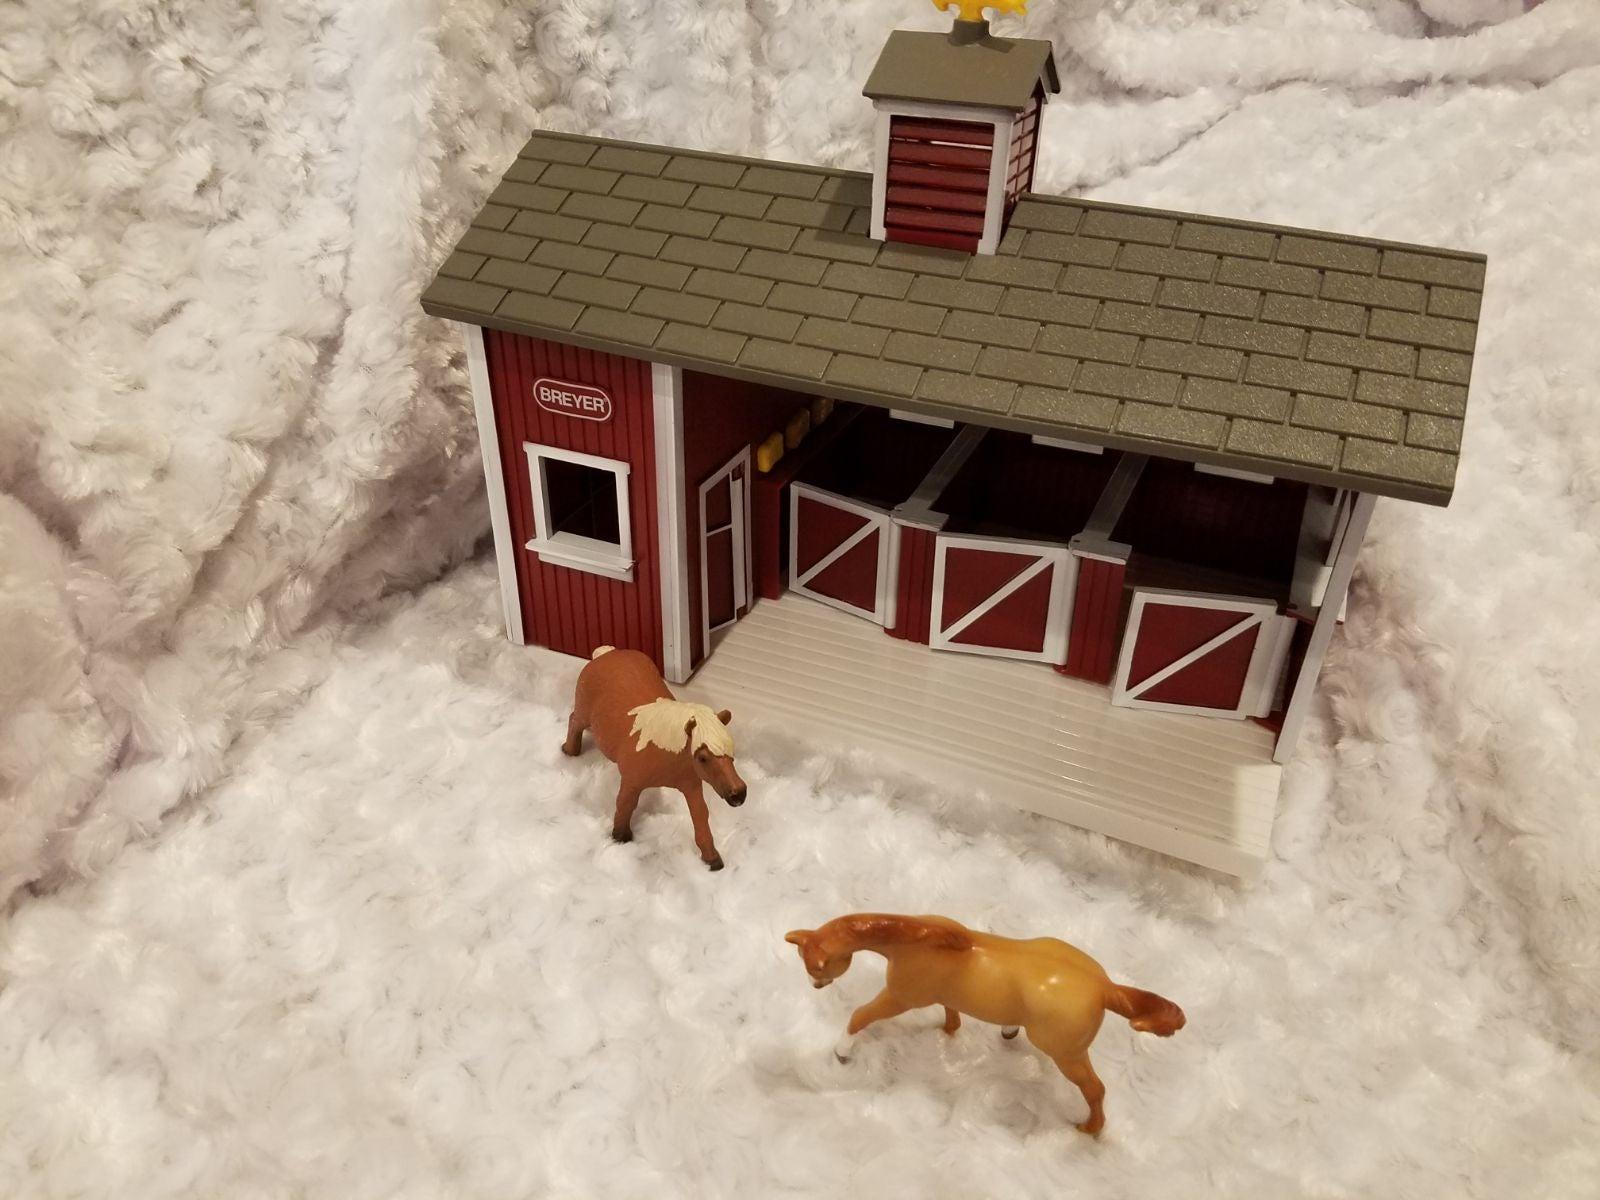 Breyer Horse stable toy